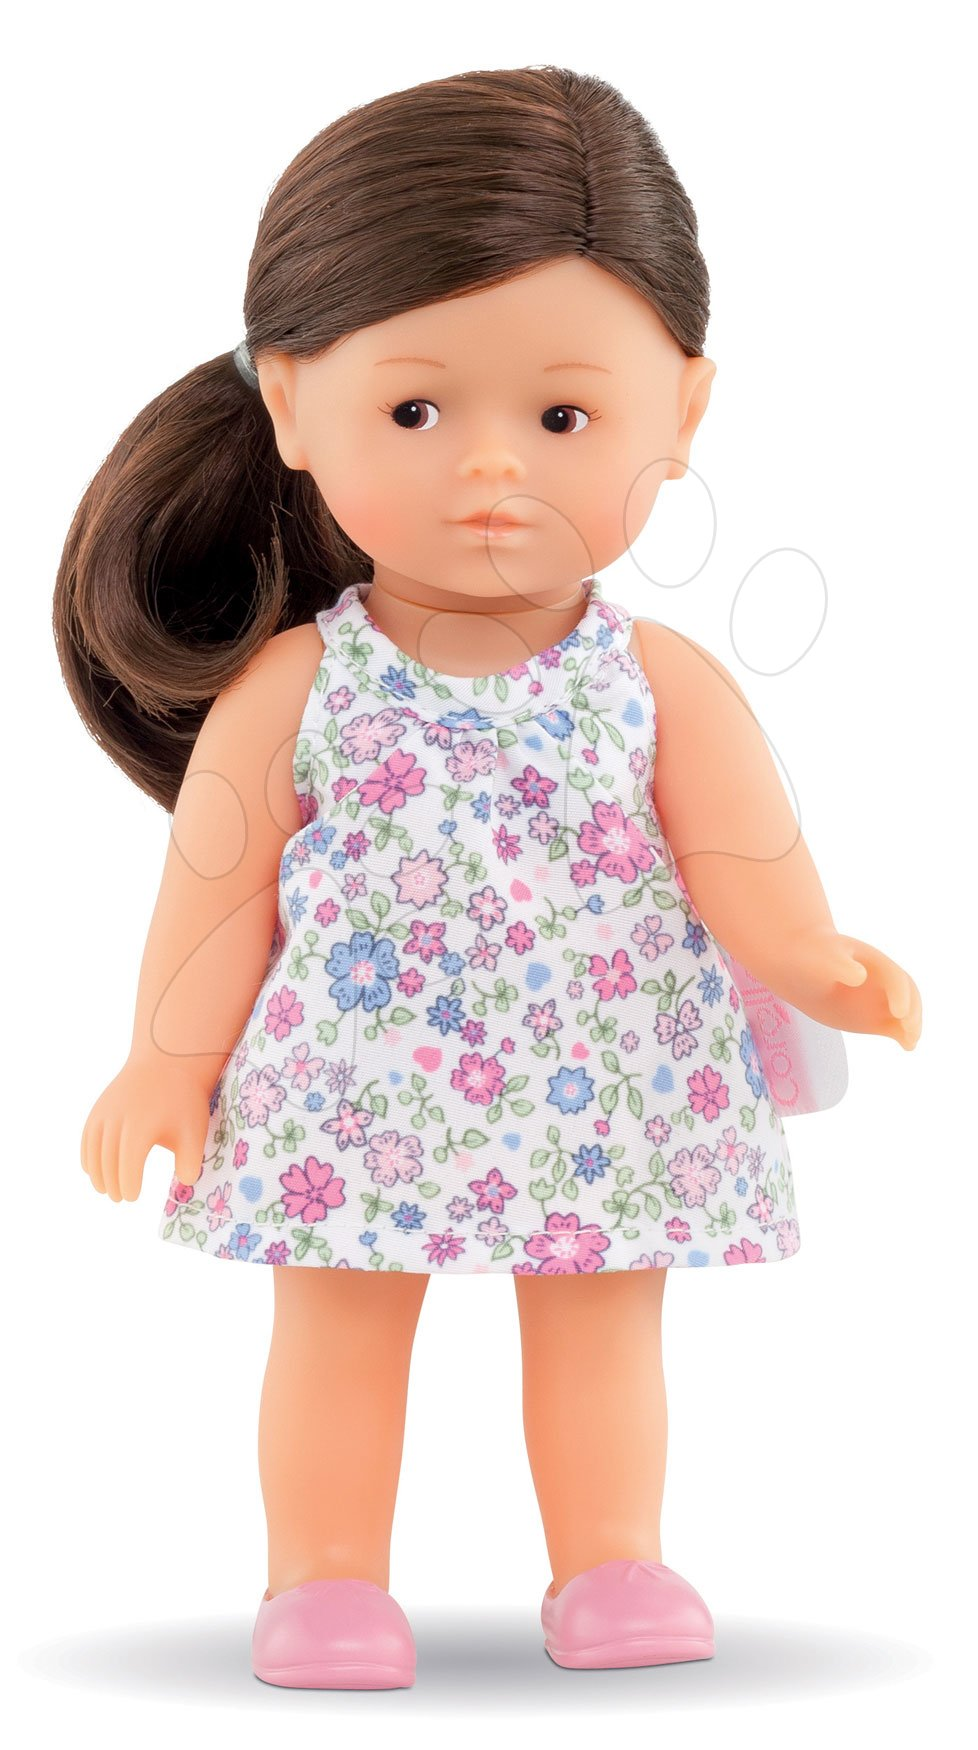 Hračky pro miminka - Panenka Mini Corolline Romy Les Trendies Corolle s hnědýma očima a modré kytičky na šatech 20 cm od 3 let